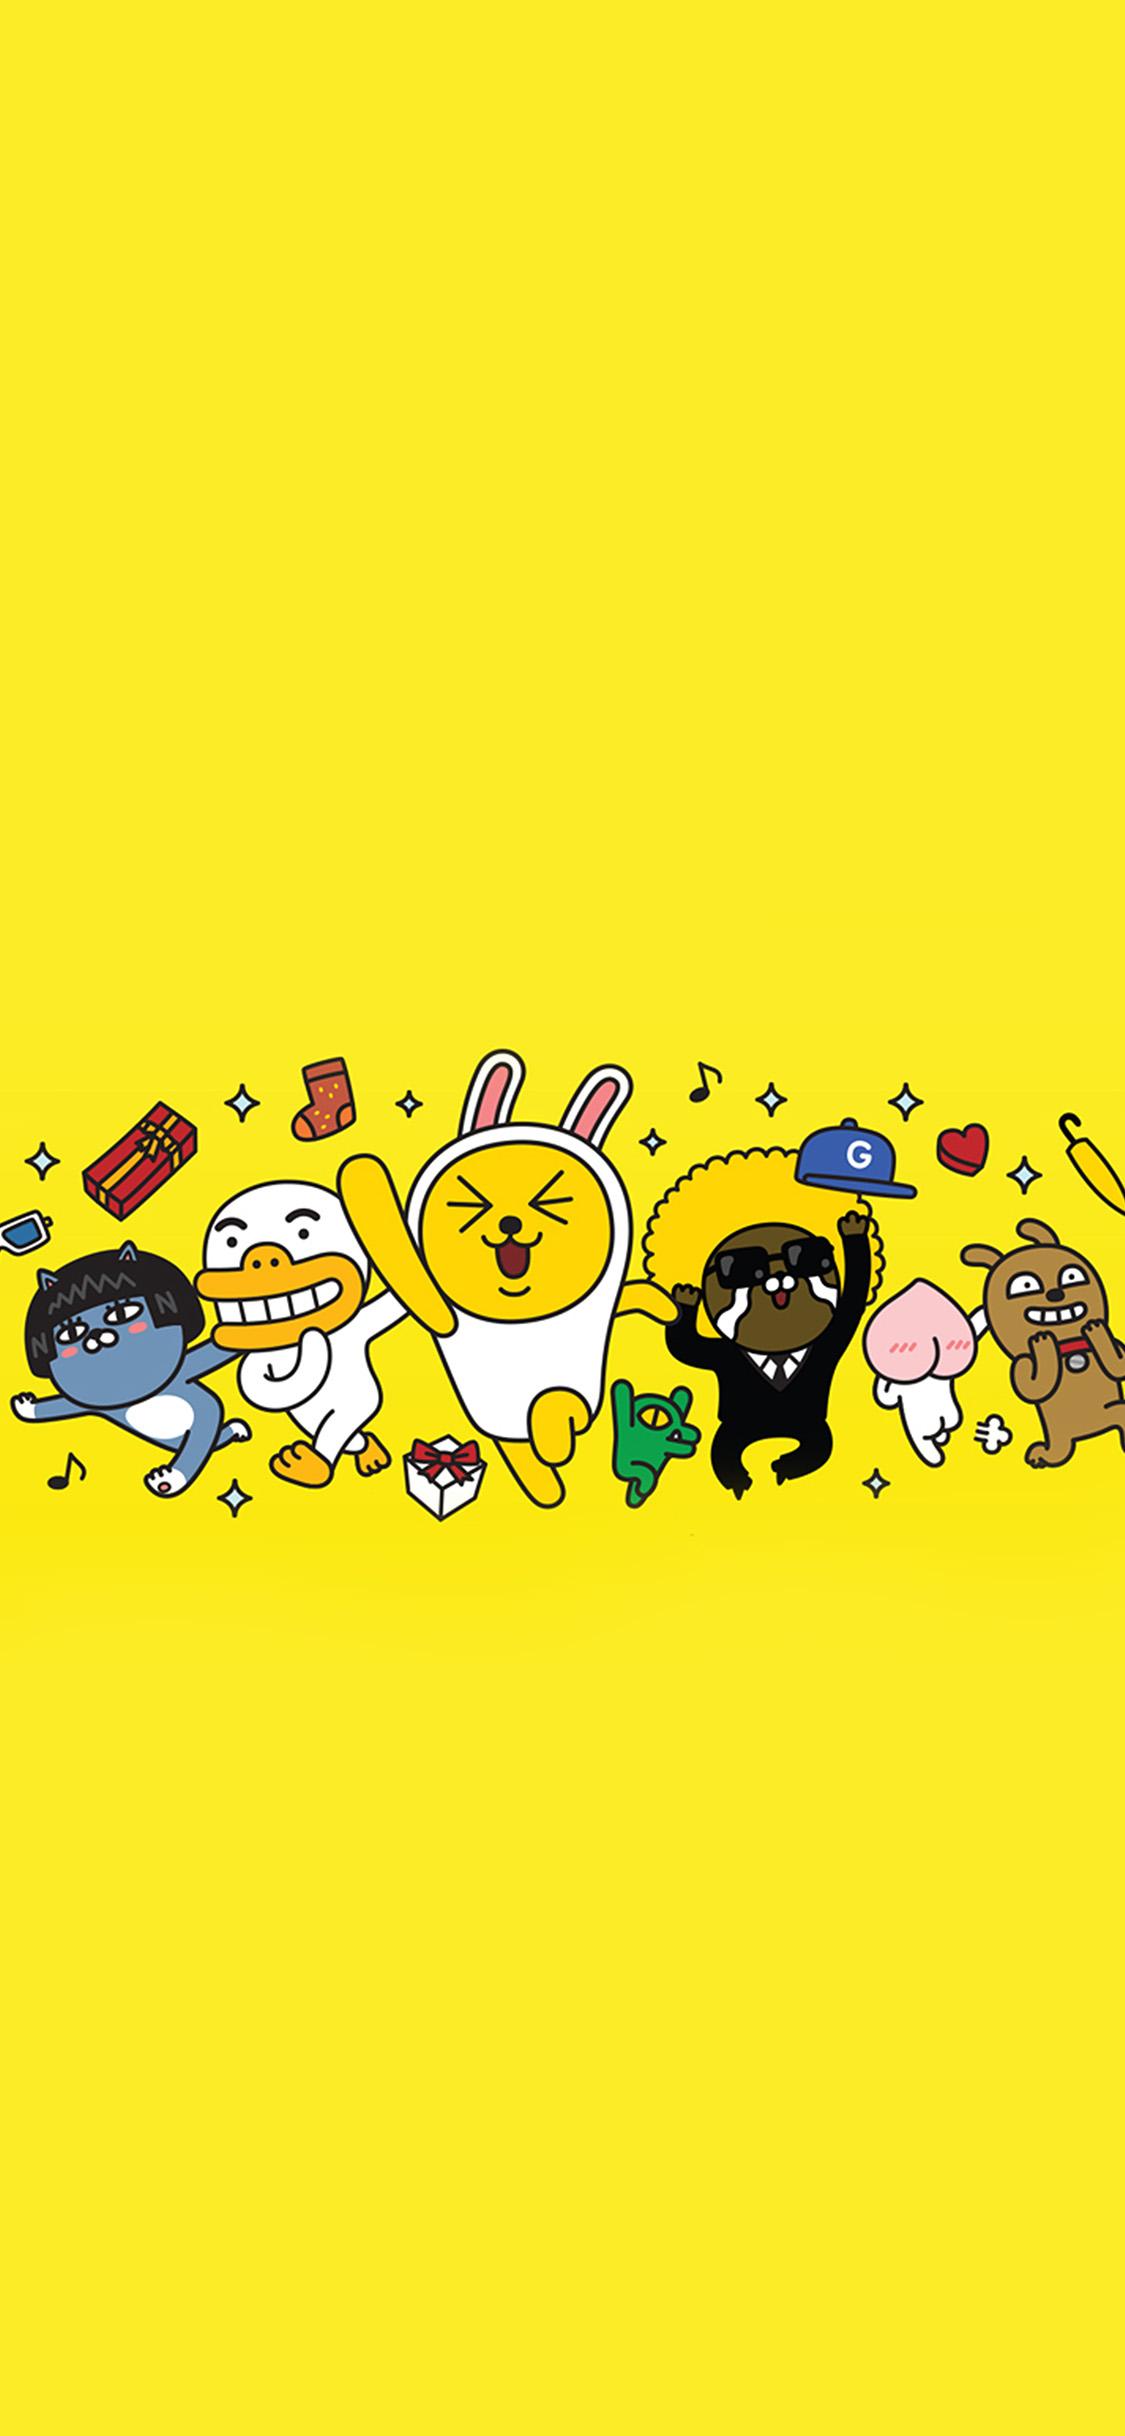 Friends Wallpaper Hd Bc88 Kakao Yellow Friends Anime Art Illustration Wallpaper